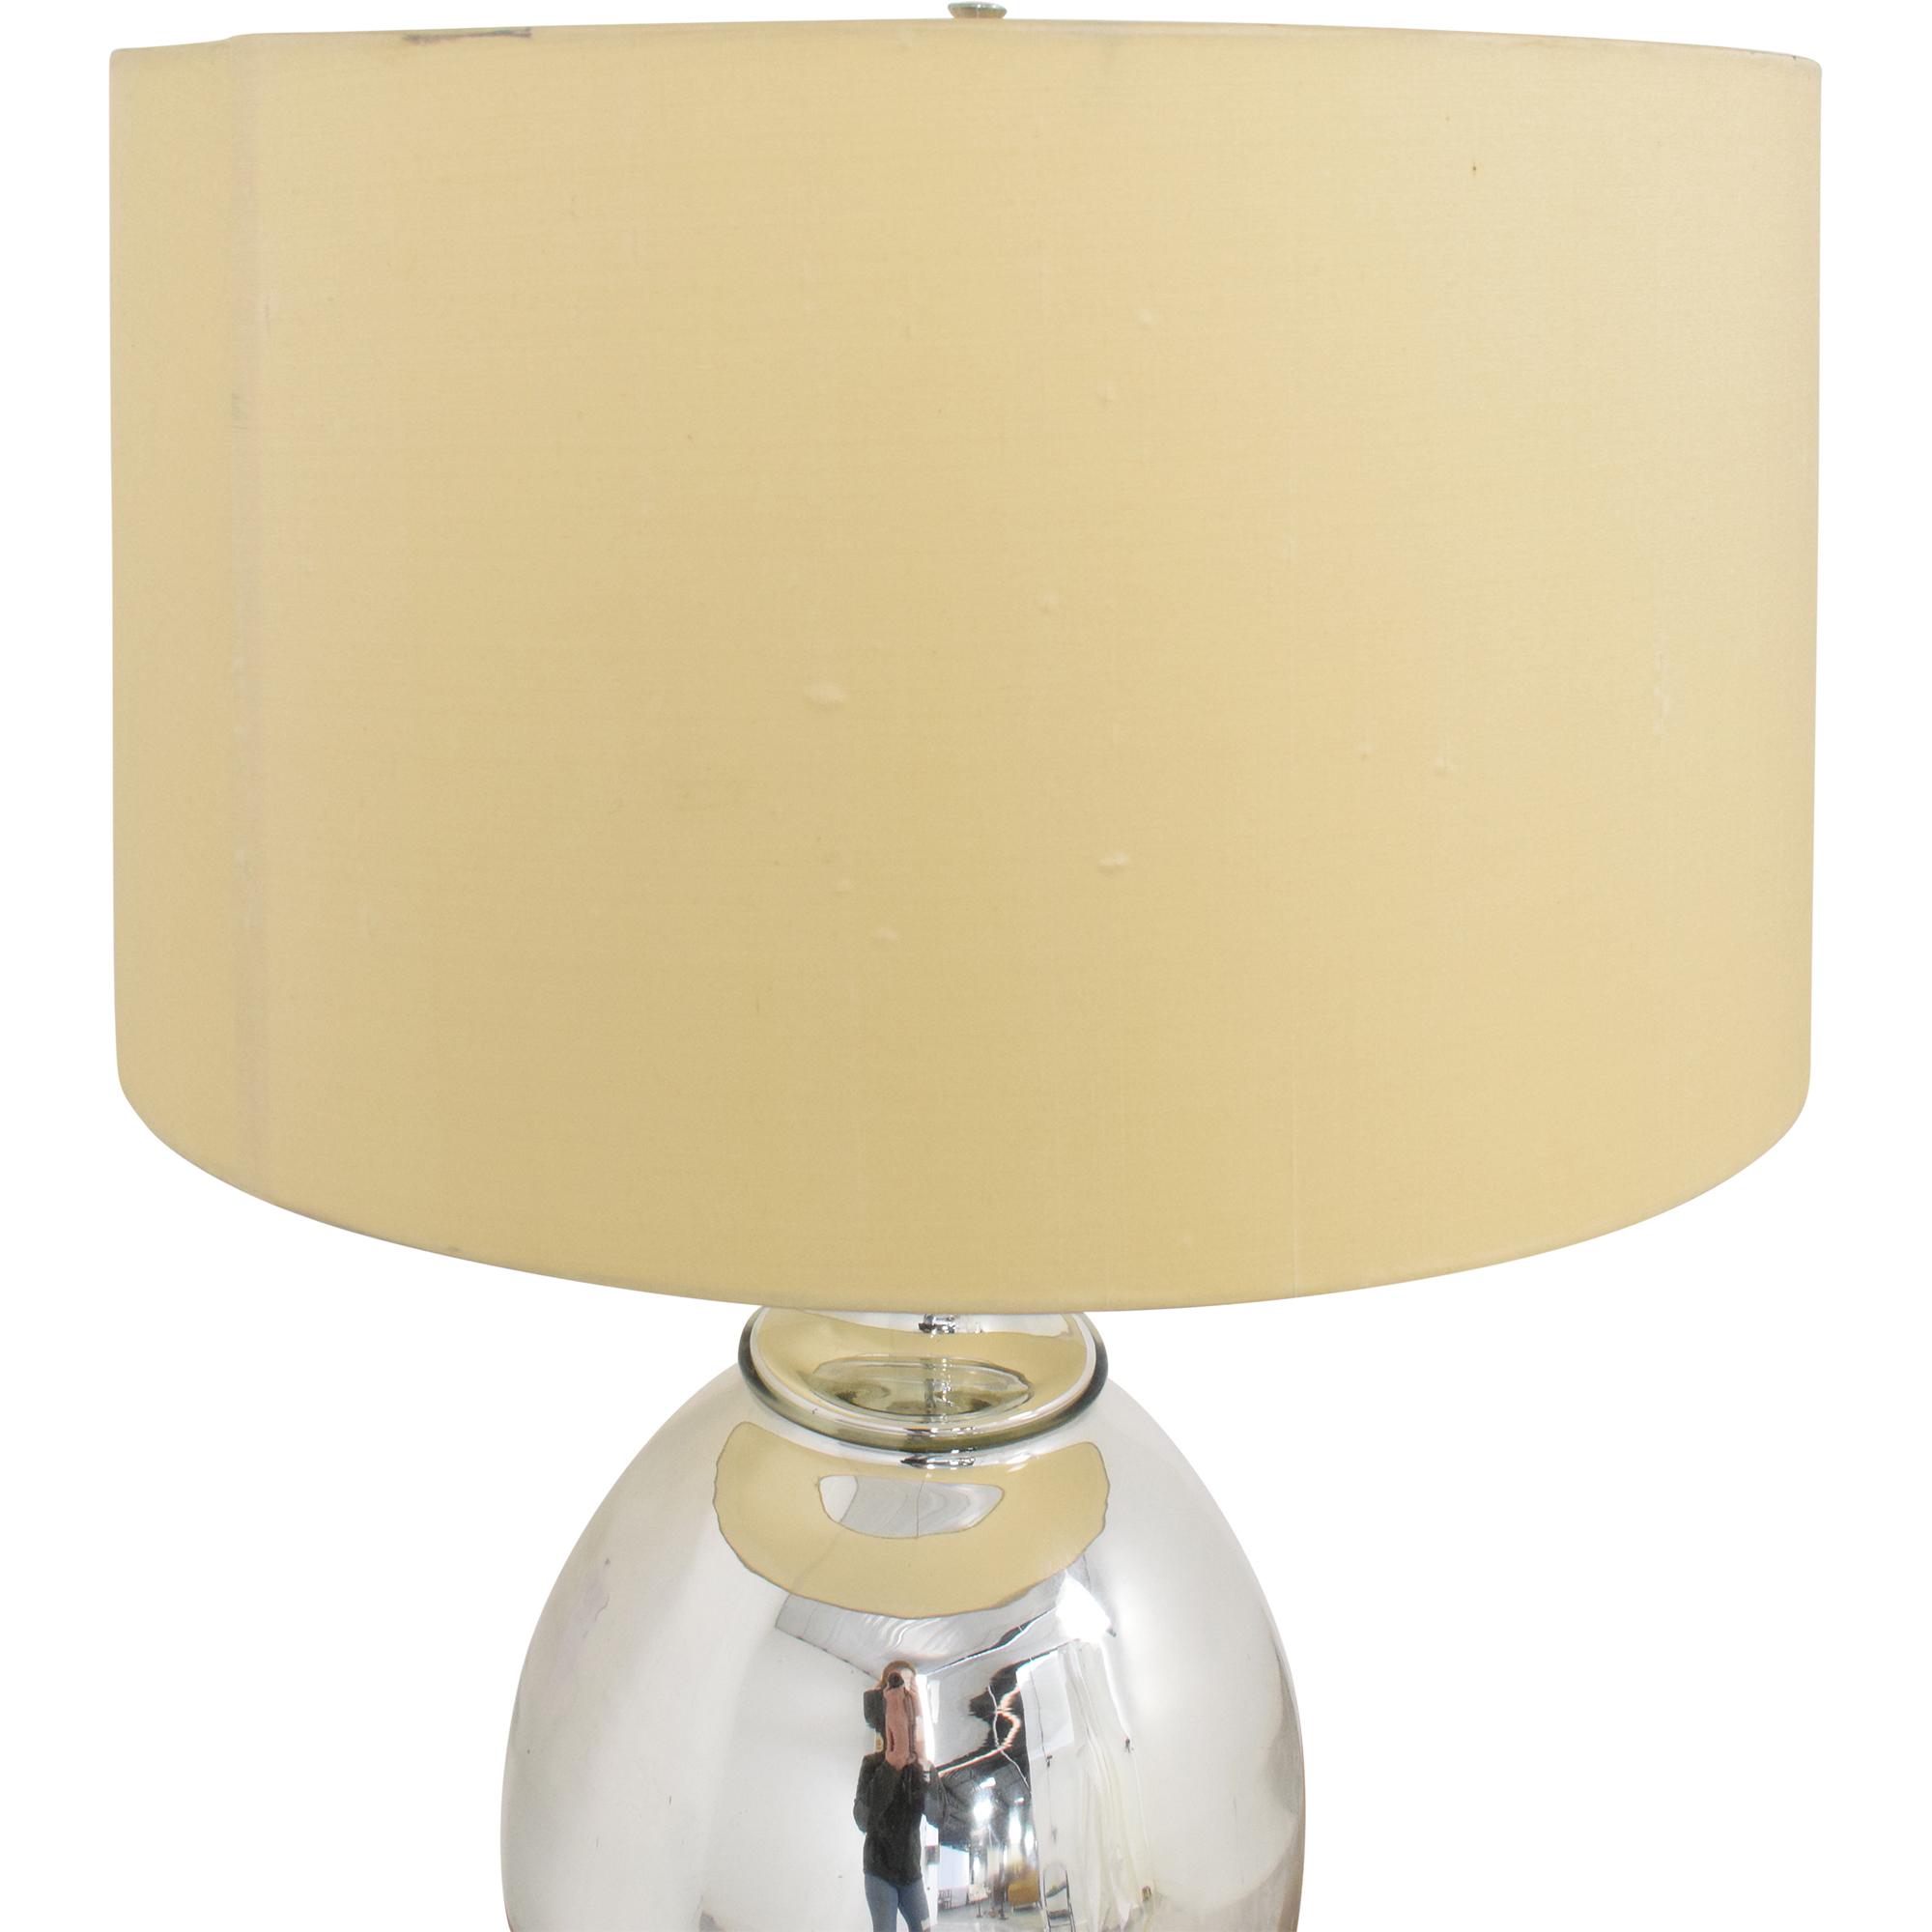 buy Decorative Table Lamp ABC Carpet & Home Decor